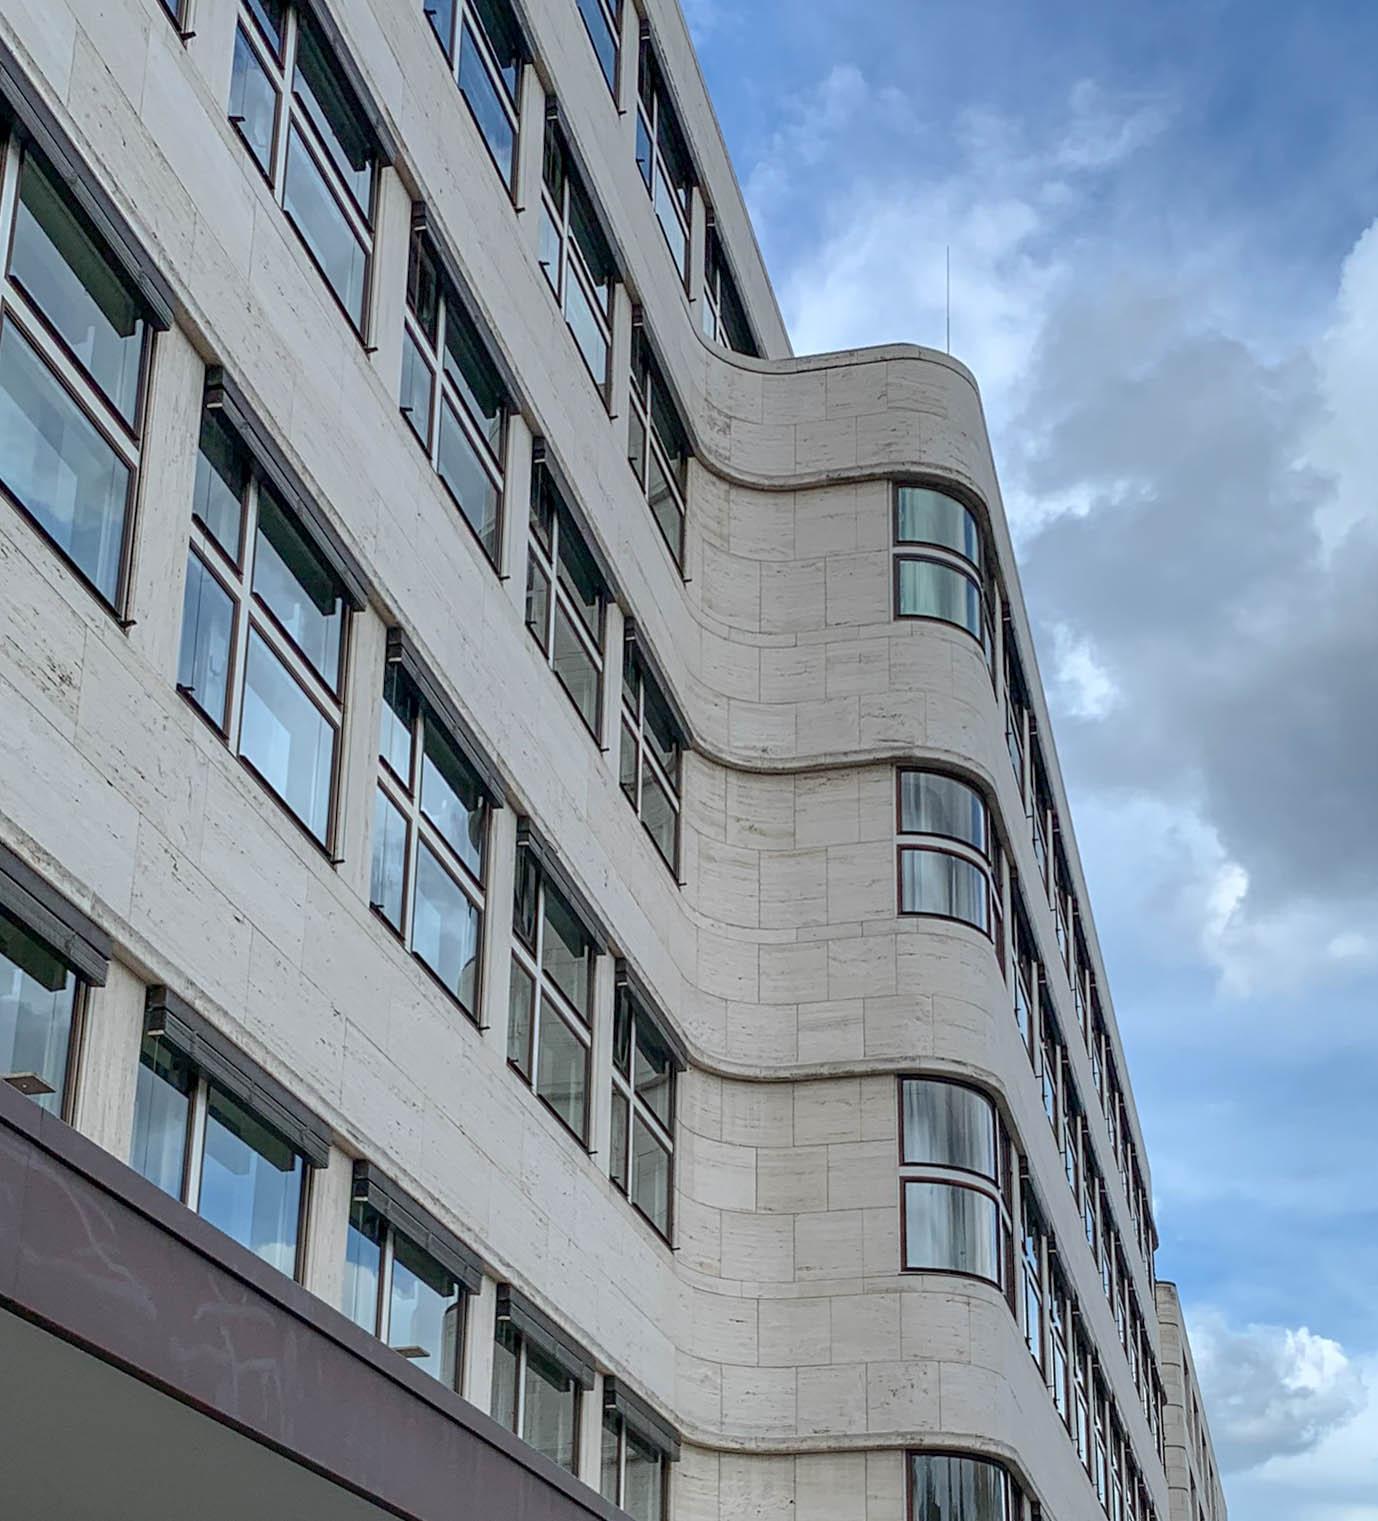 Schell-Haus, 1930-1932. Architect: Emil Fahrenkamp